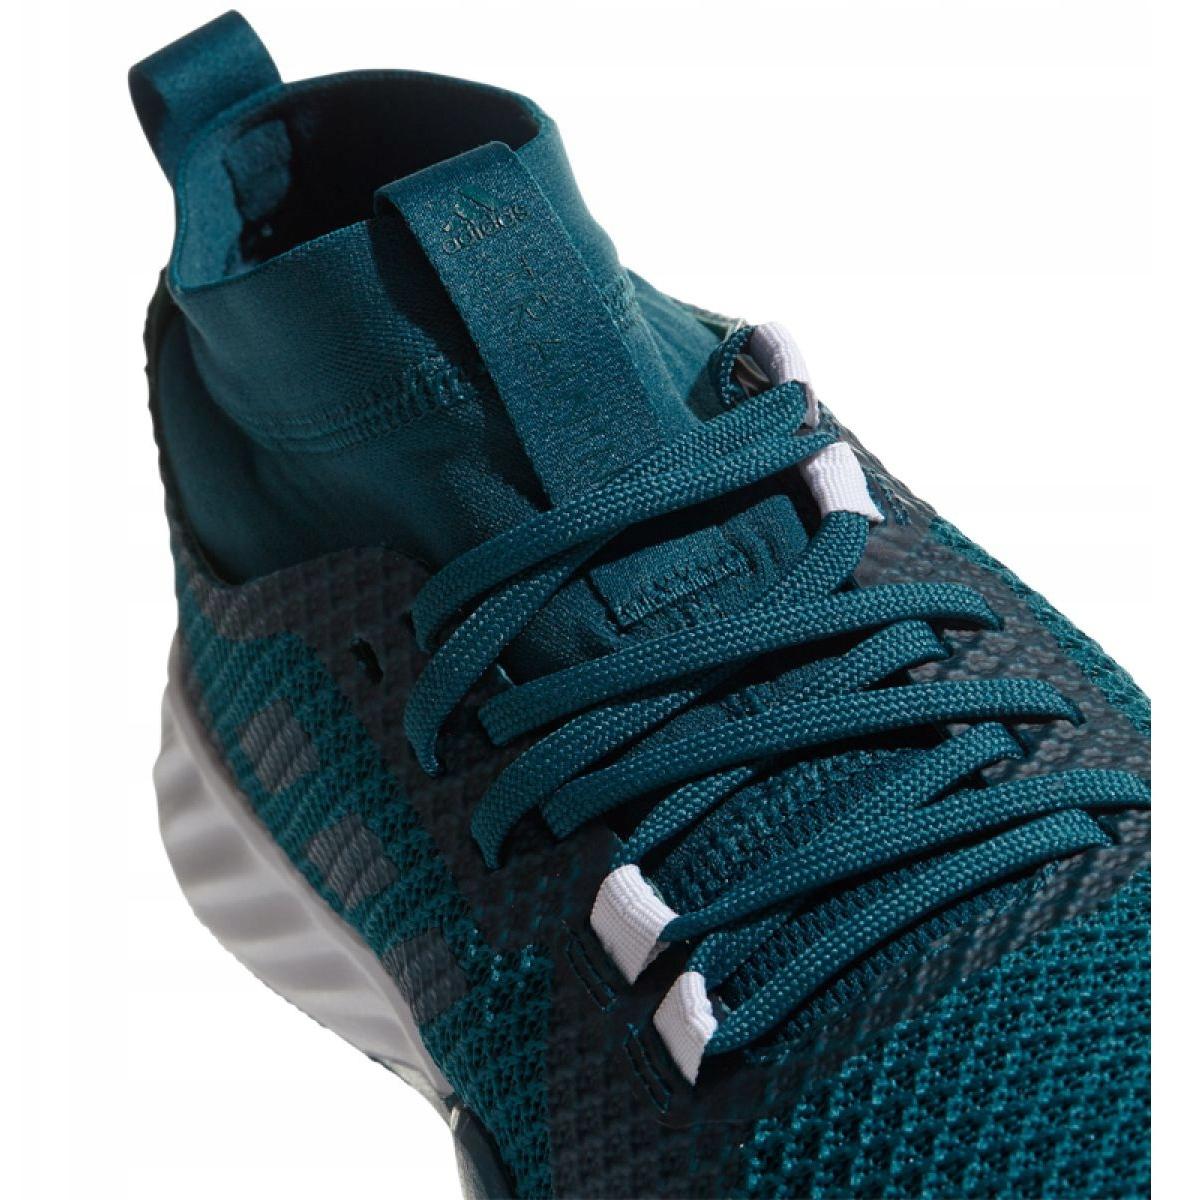 Adidas Crazytrain Pro 3.0 M CG3474